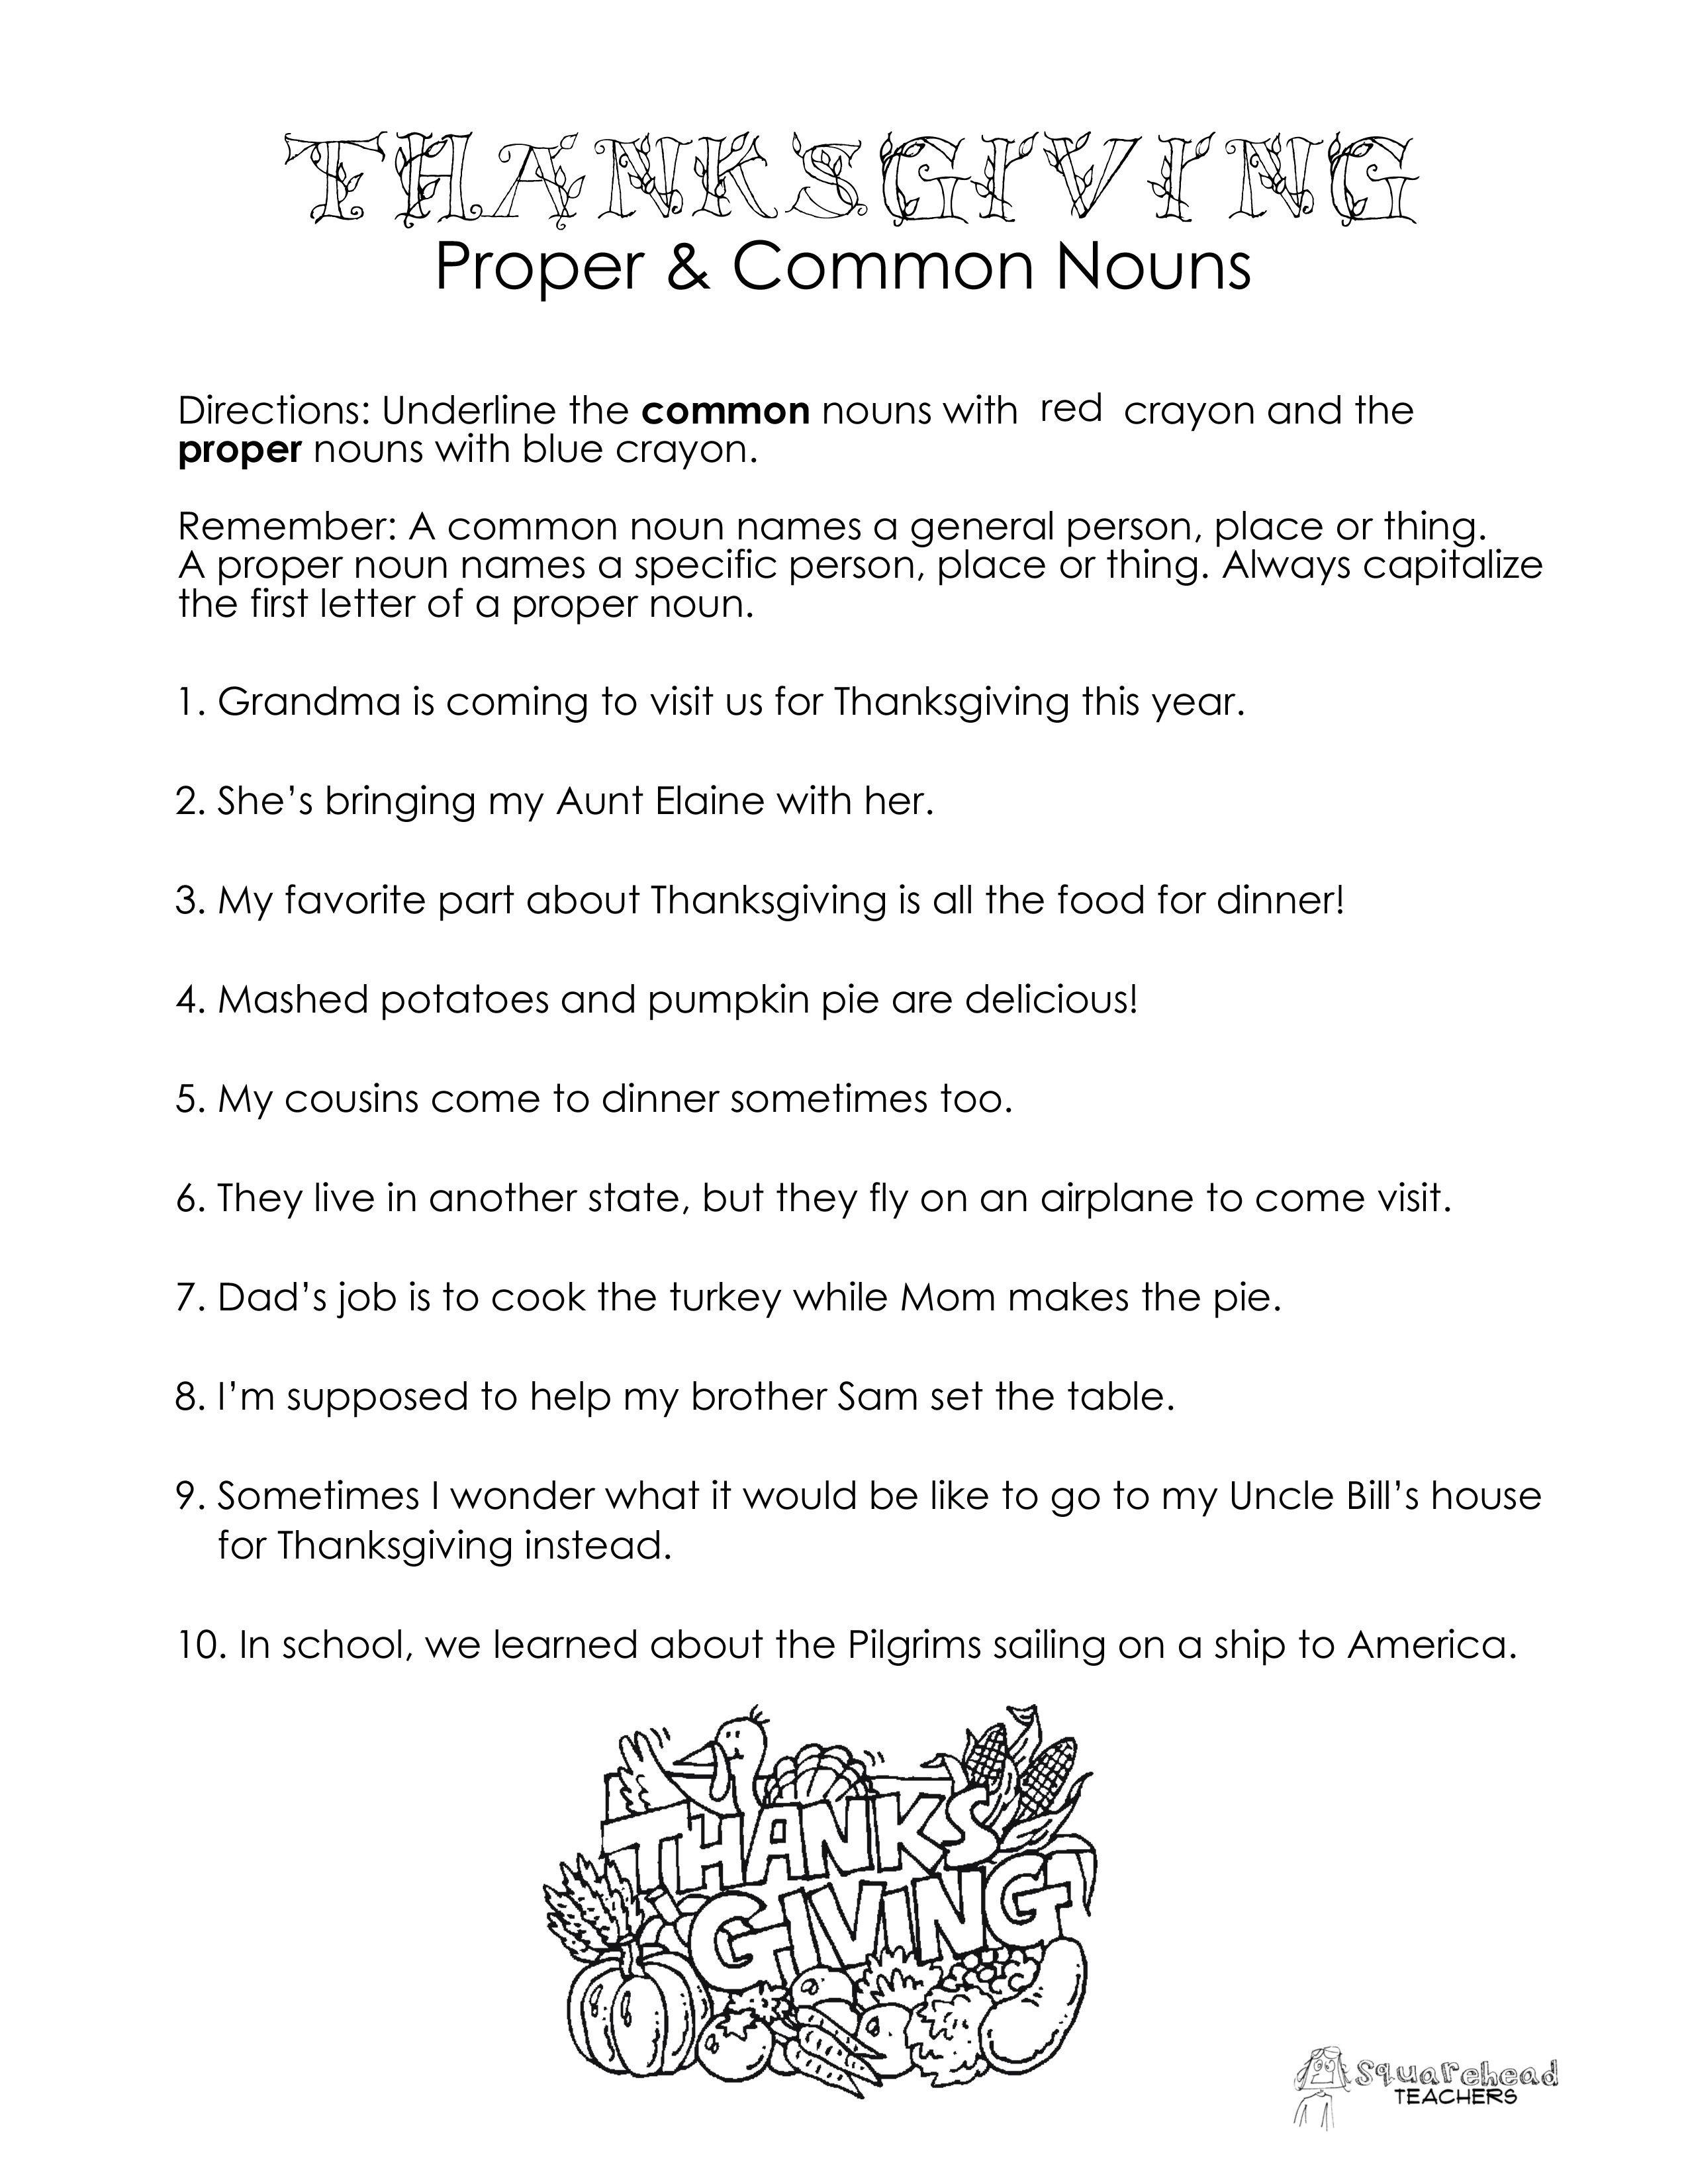 Thanksgiving proper & common nouns | Thanksgiving | Pinterest ...